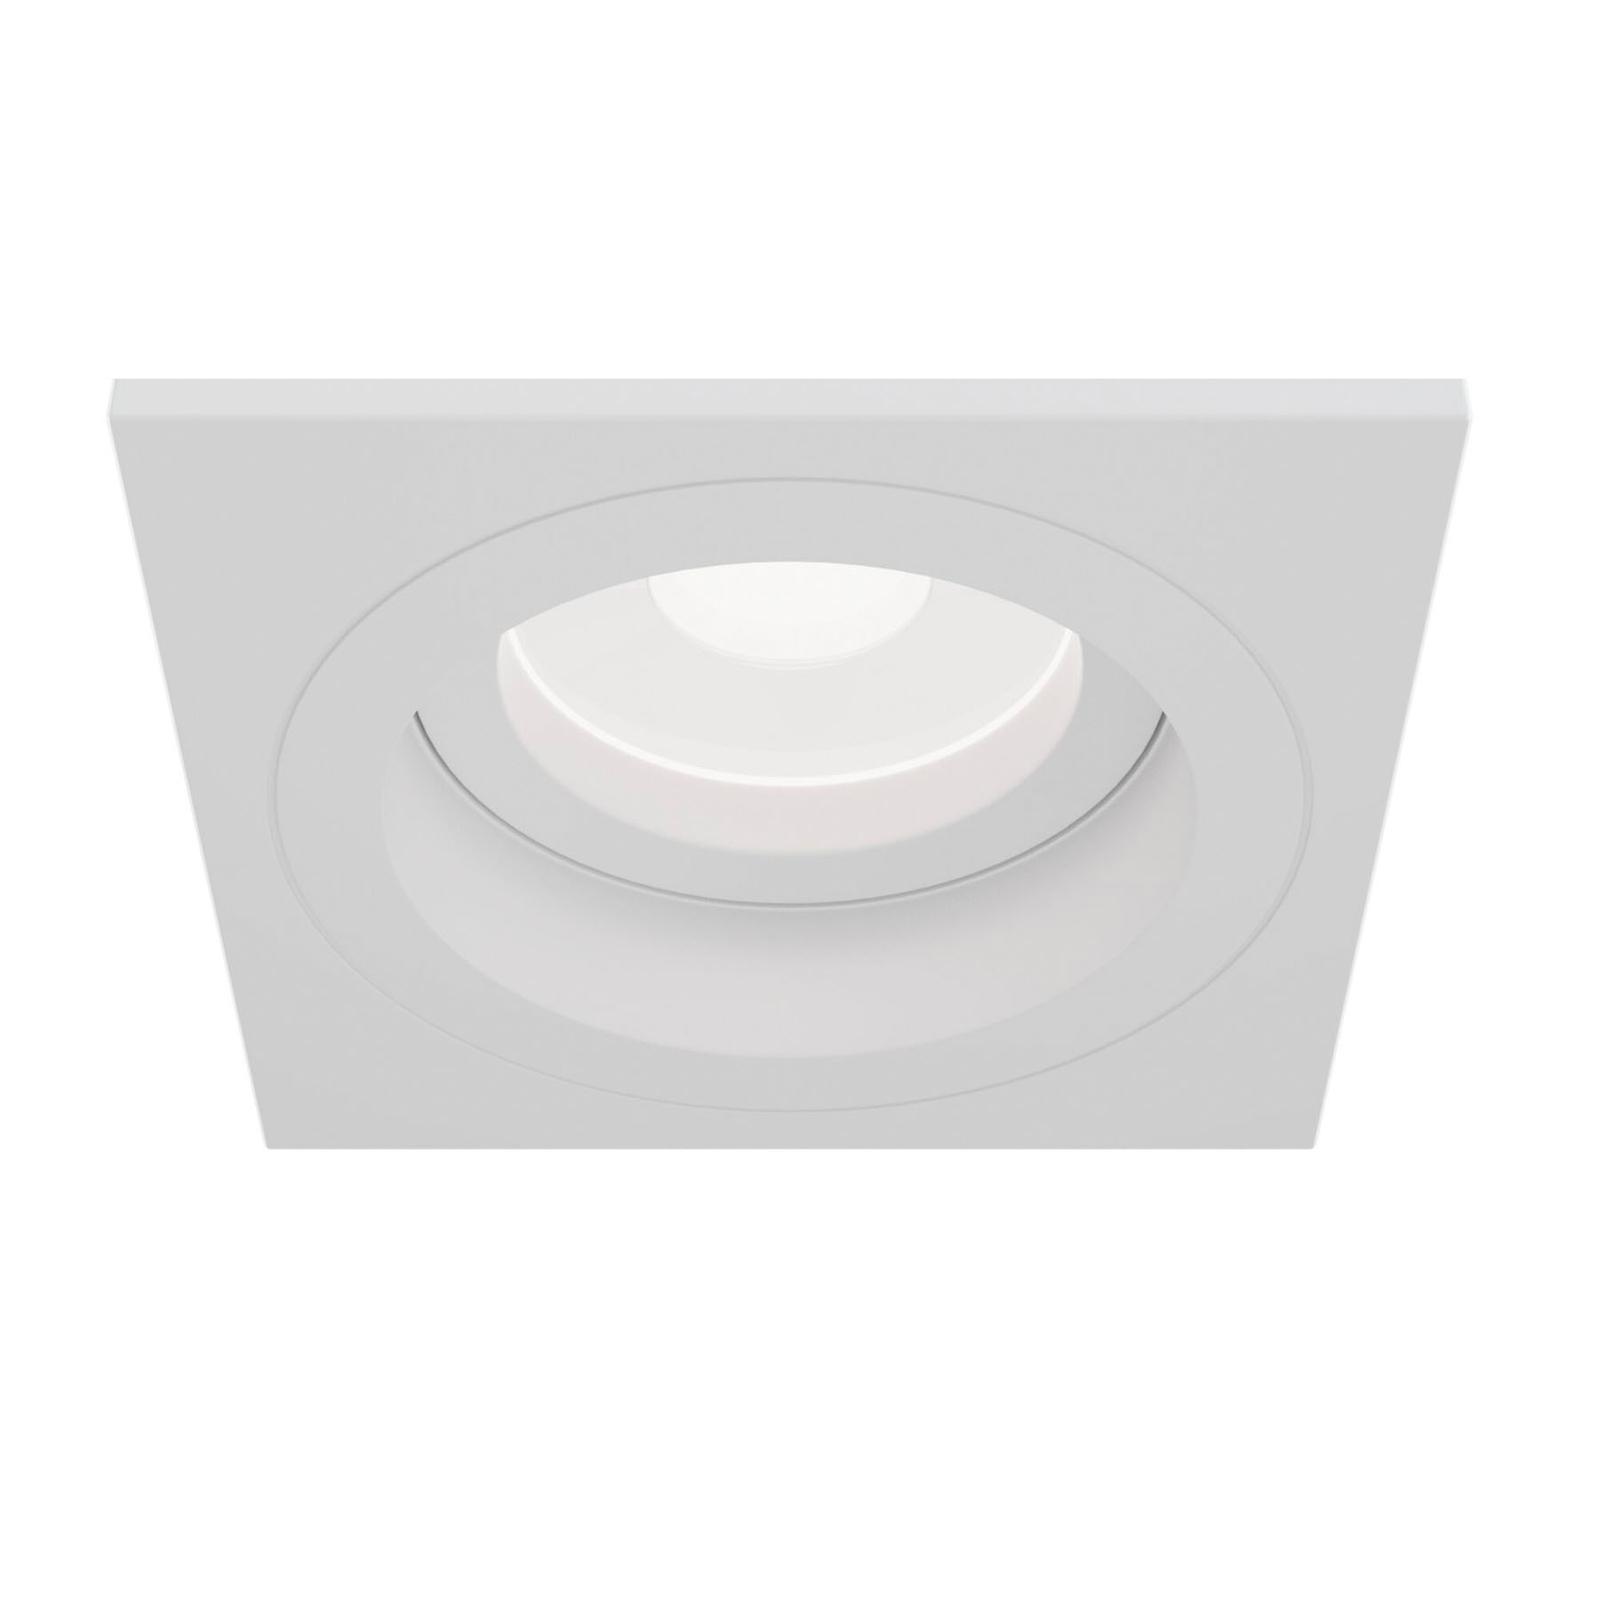 Akron indbygningslampe, justerbar, kantet, hvid